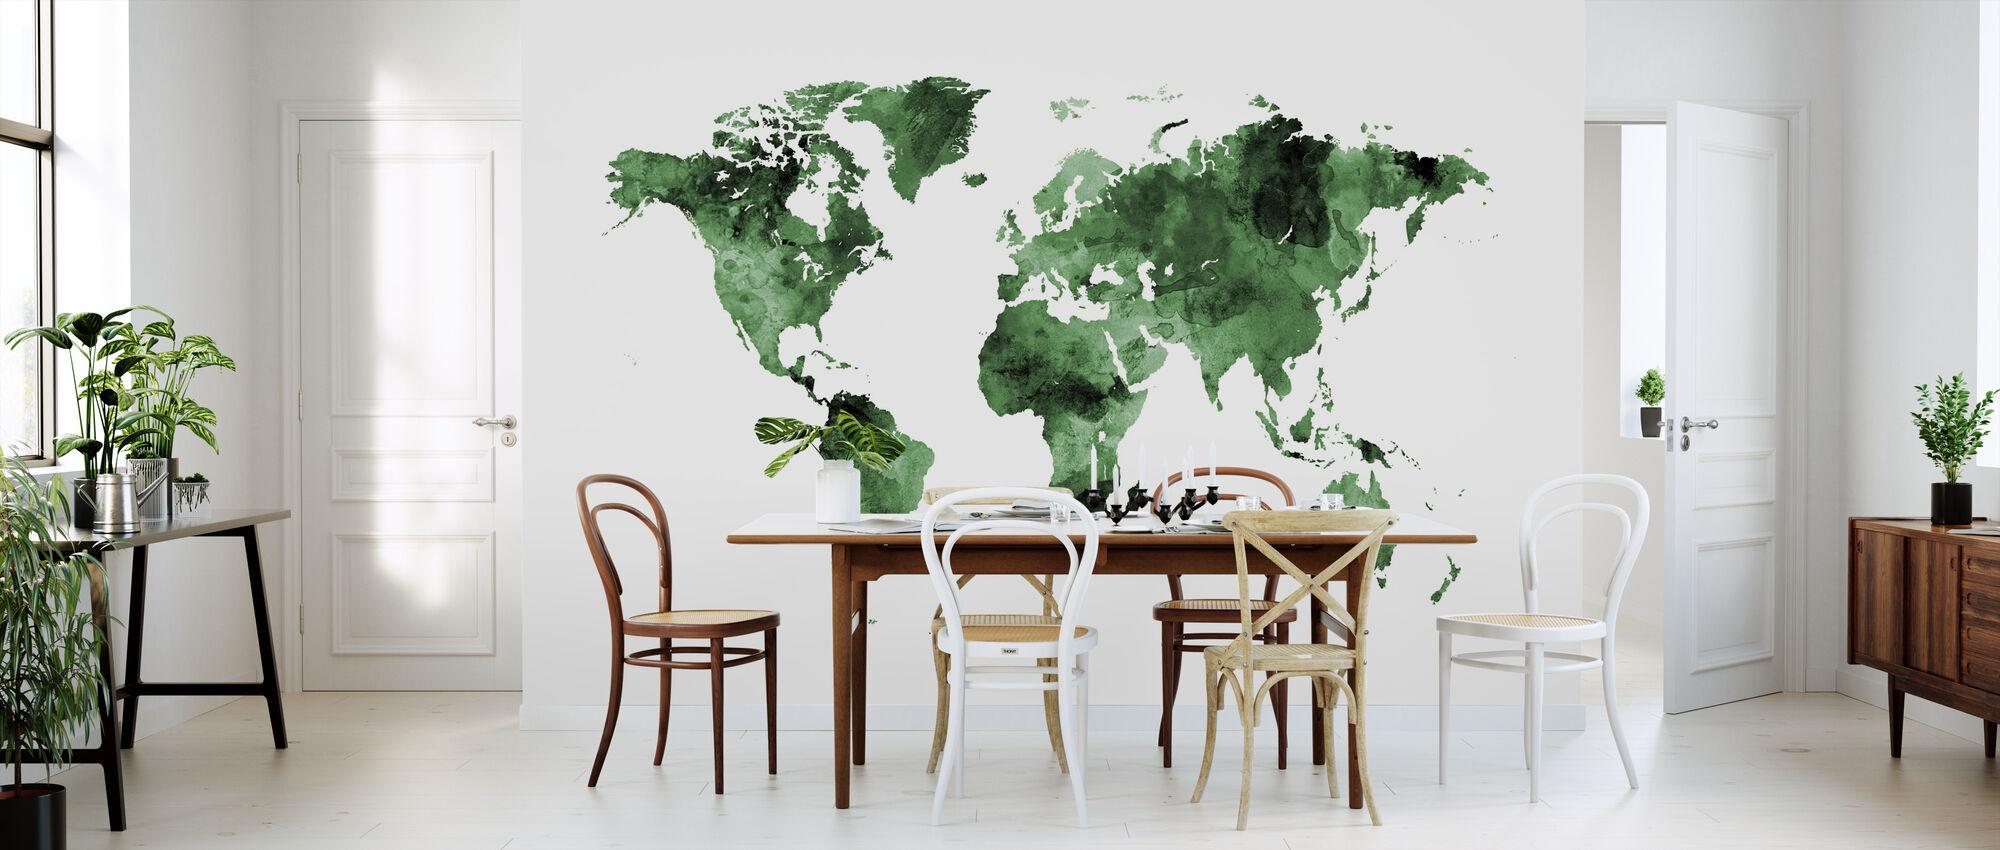 Watercolour World Map Green - Wallpaper - Kitchen